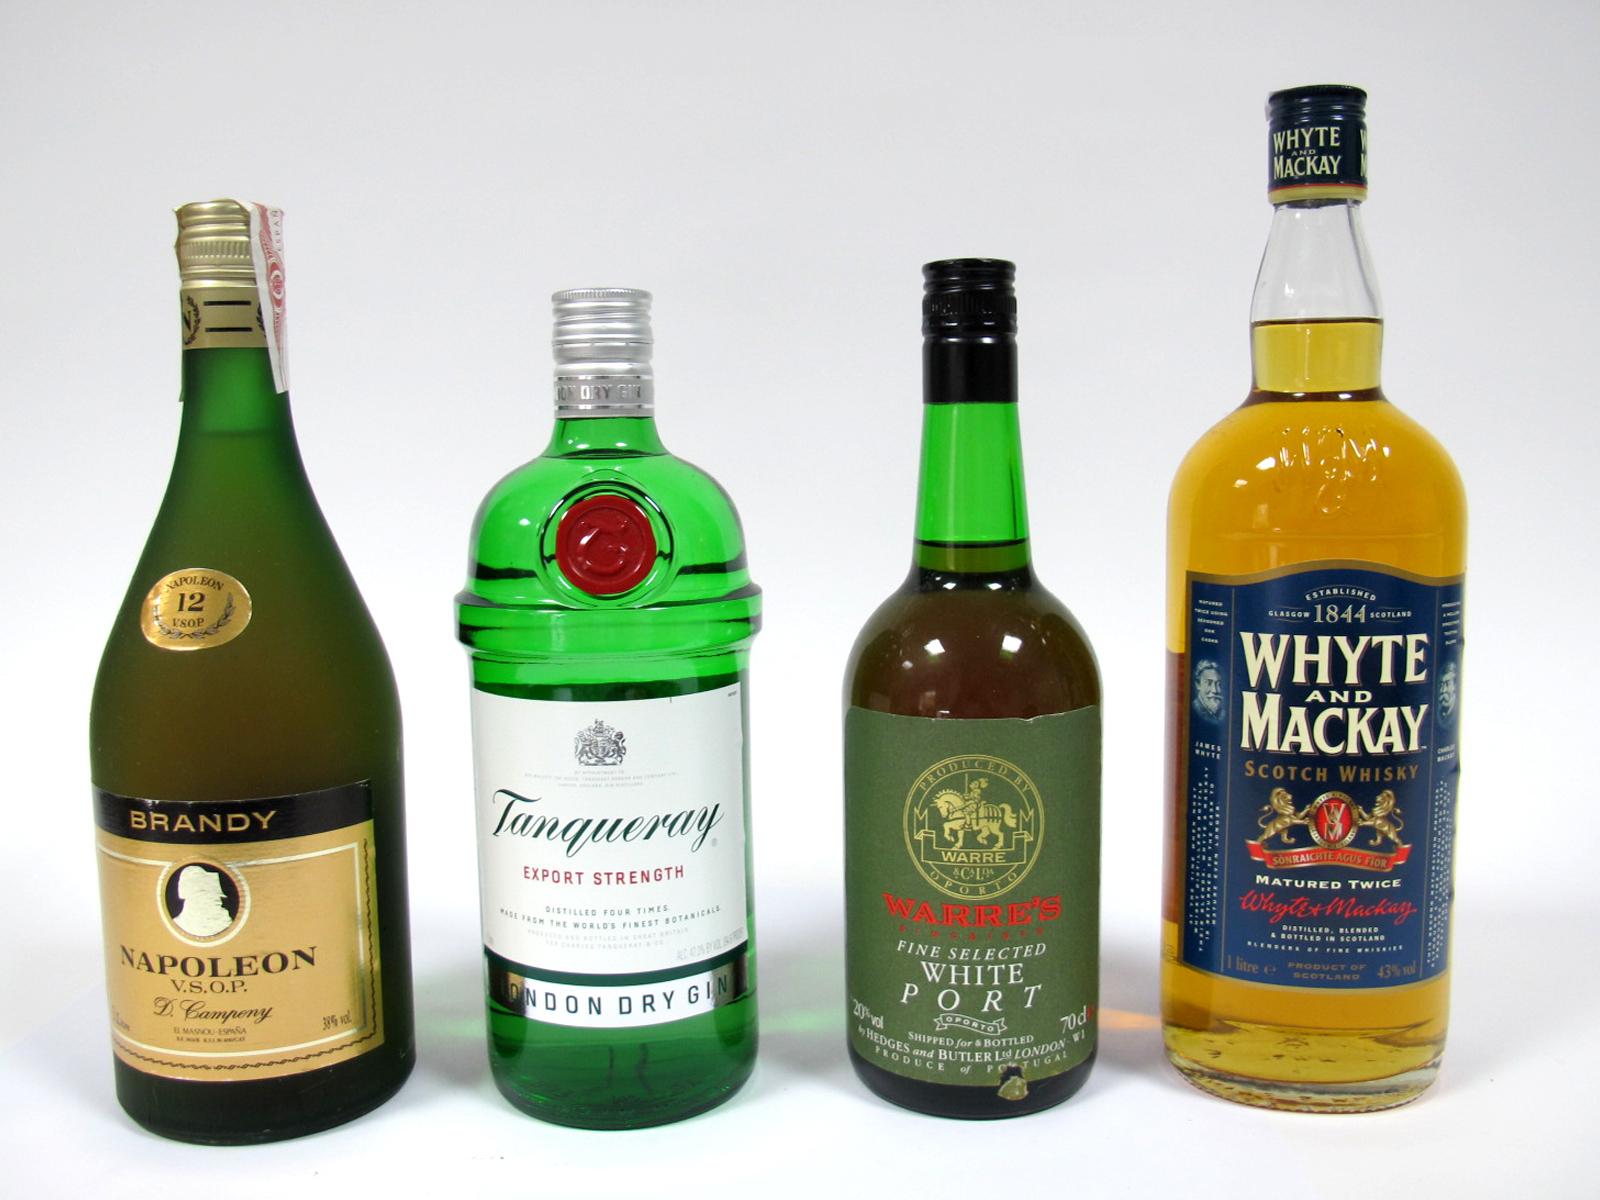 Lot 55 - Spirits - Napoleon V.S.O.P. Brandy, 1 litre, 38% Vol.; Warre's Fine Selected White Port, 70cl, 20%